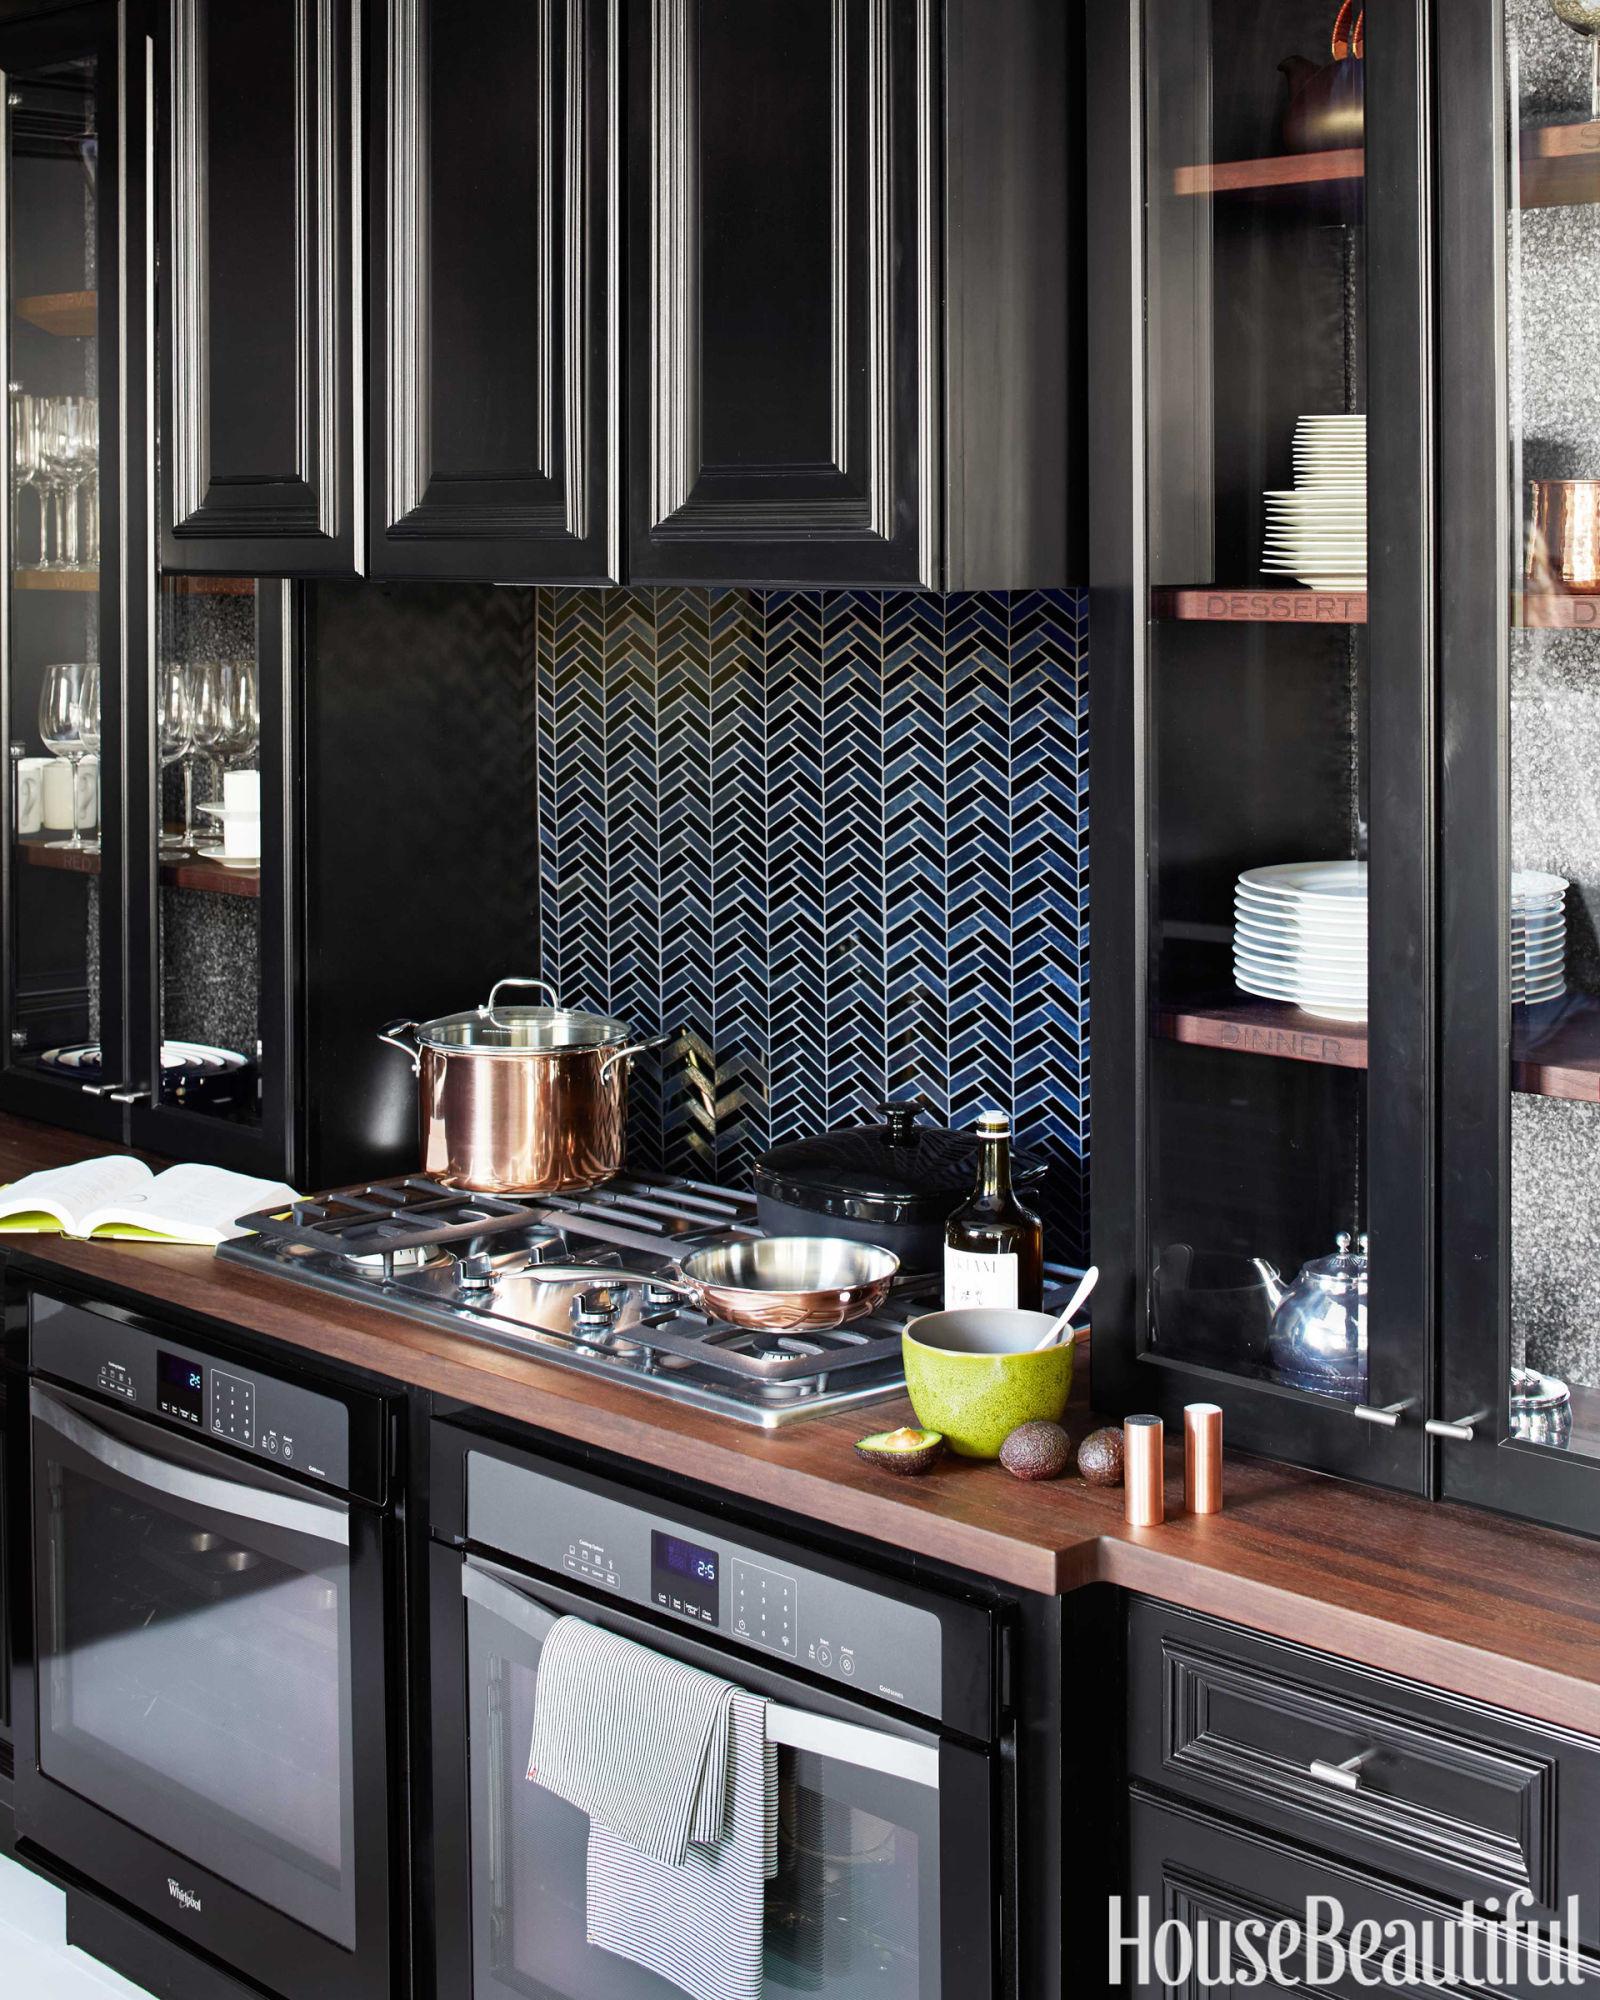 House Beautiful Kitchen: Steven Miller Kitchen Design